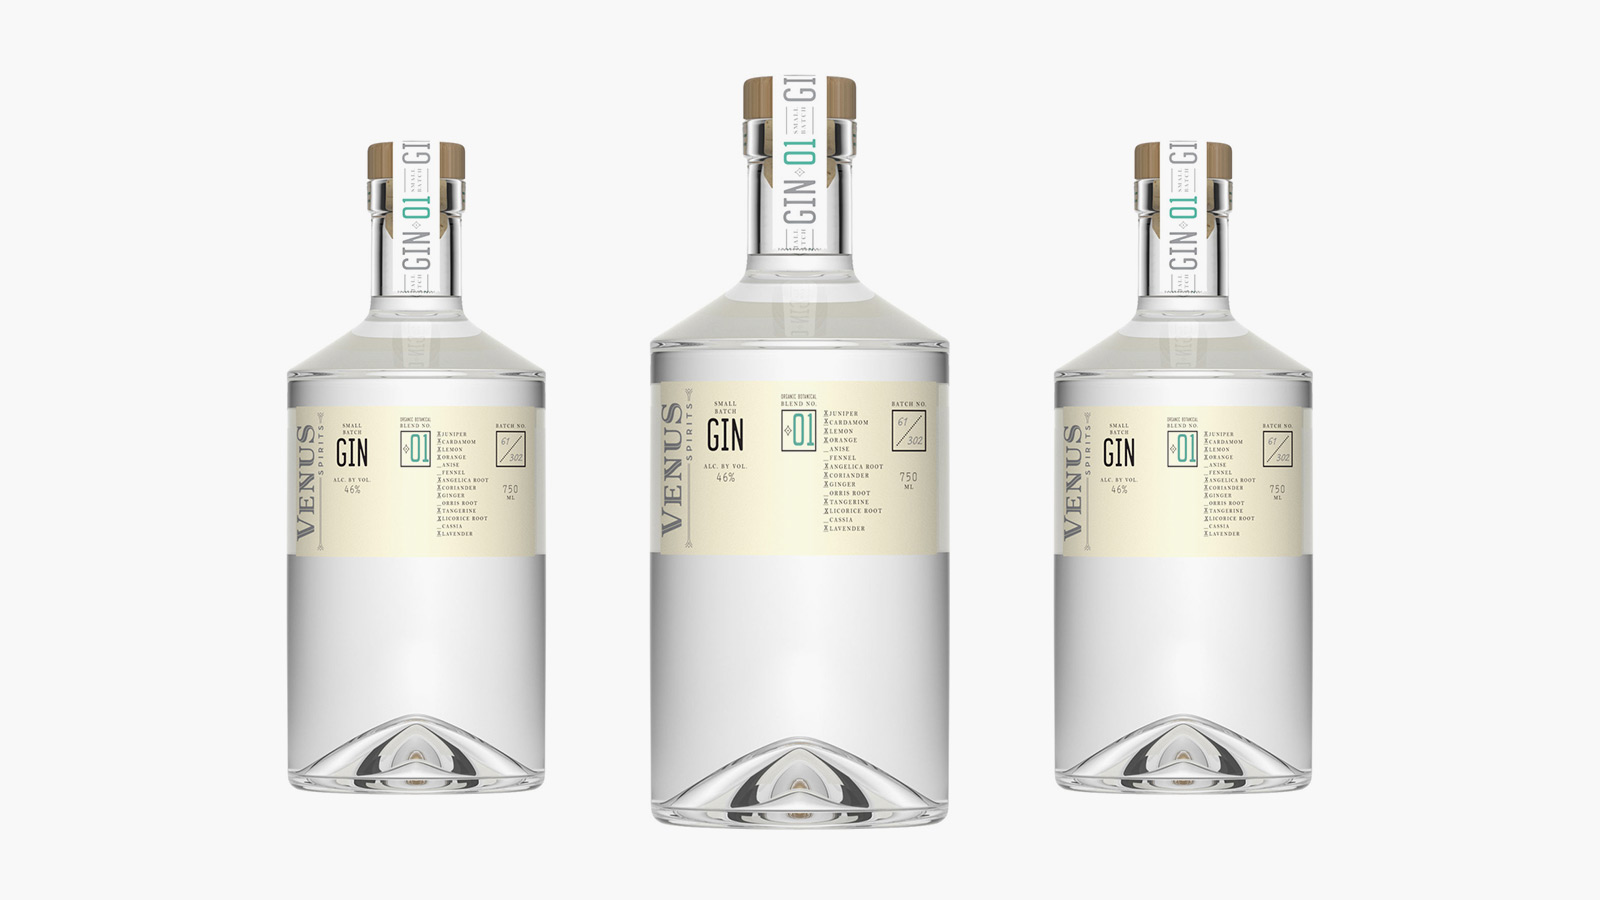 Venus Spirits Gin Blend No. 01